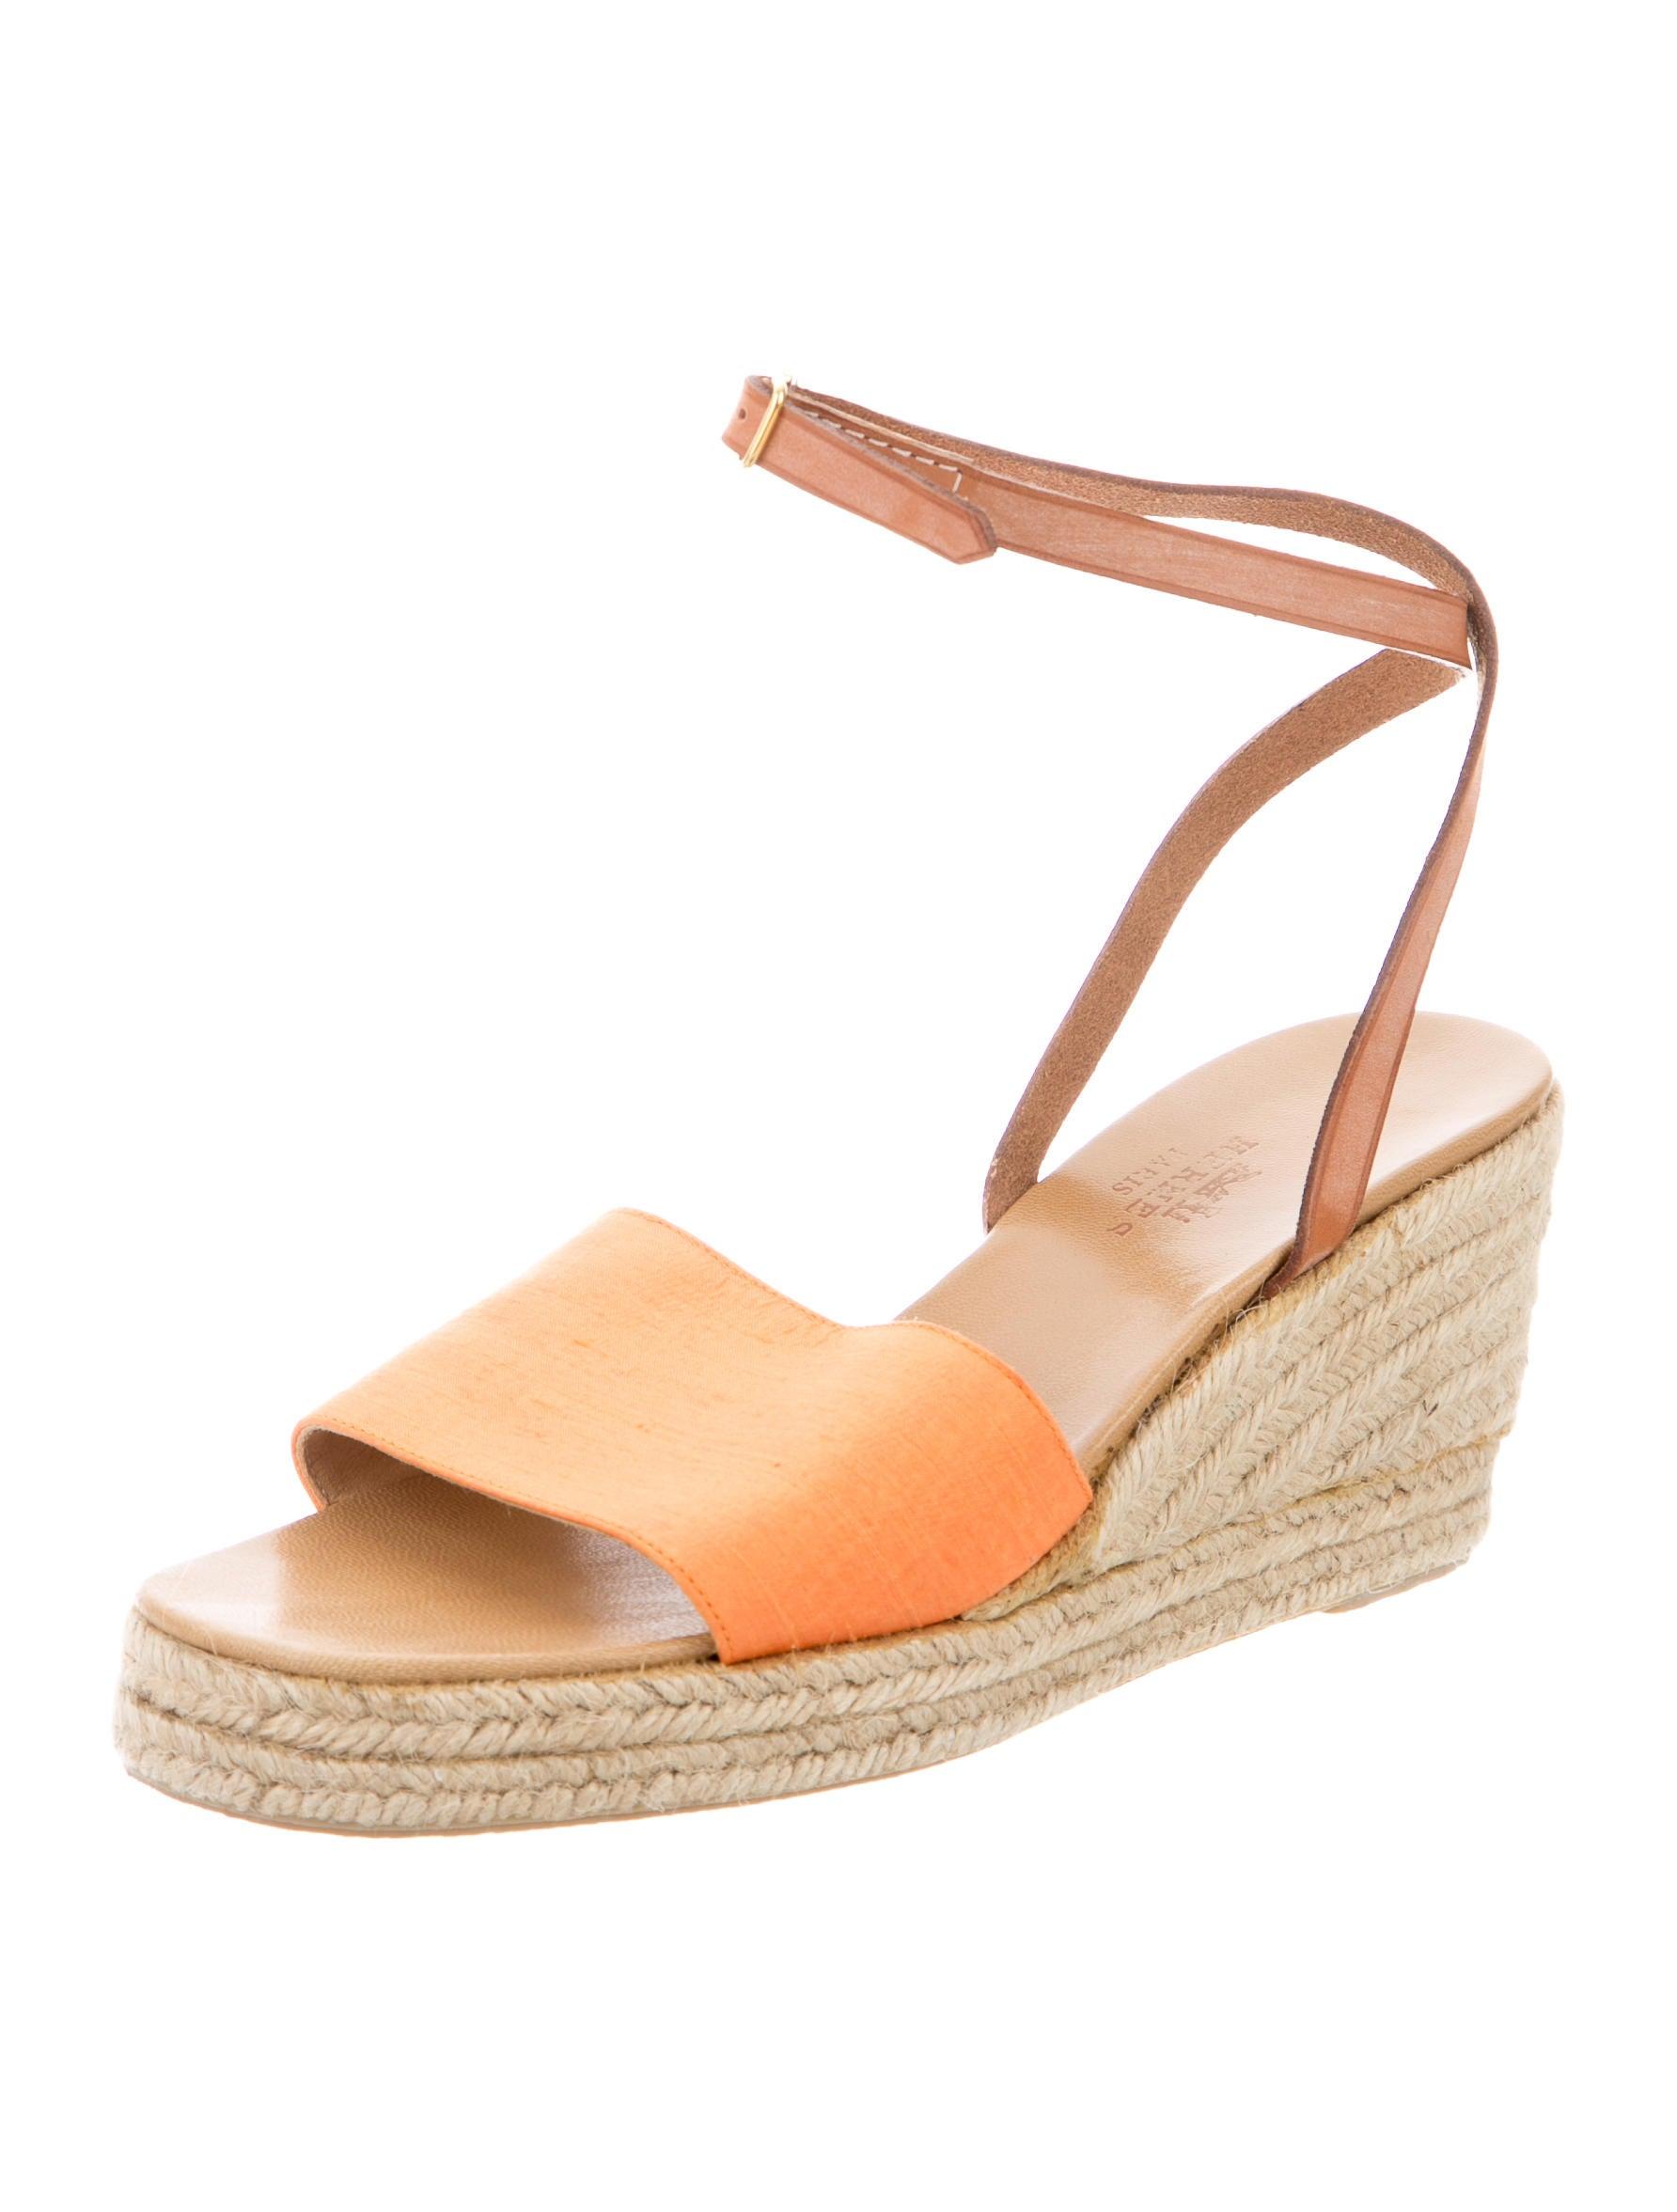 hermes women shoes - photo #21